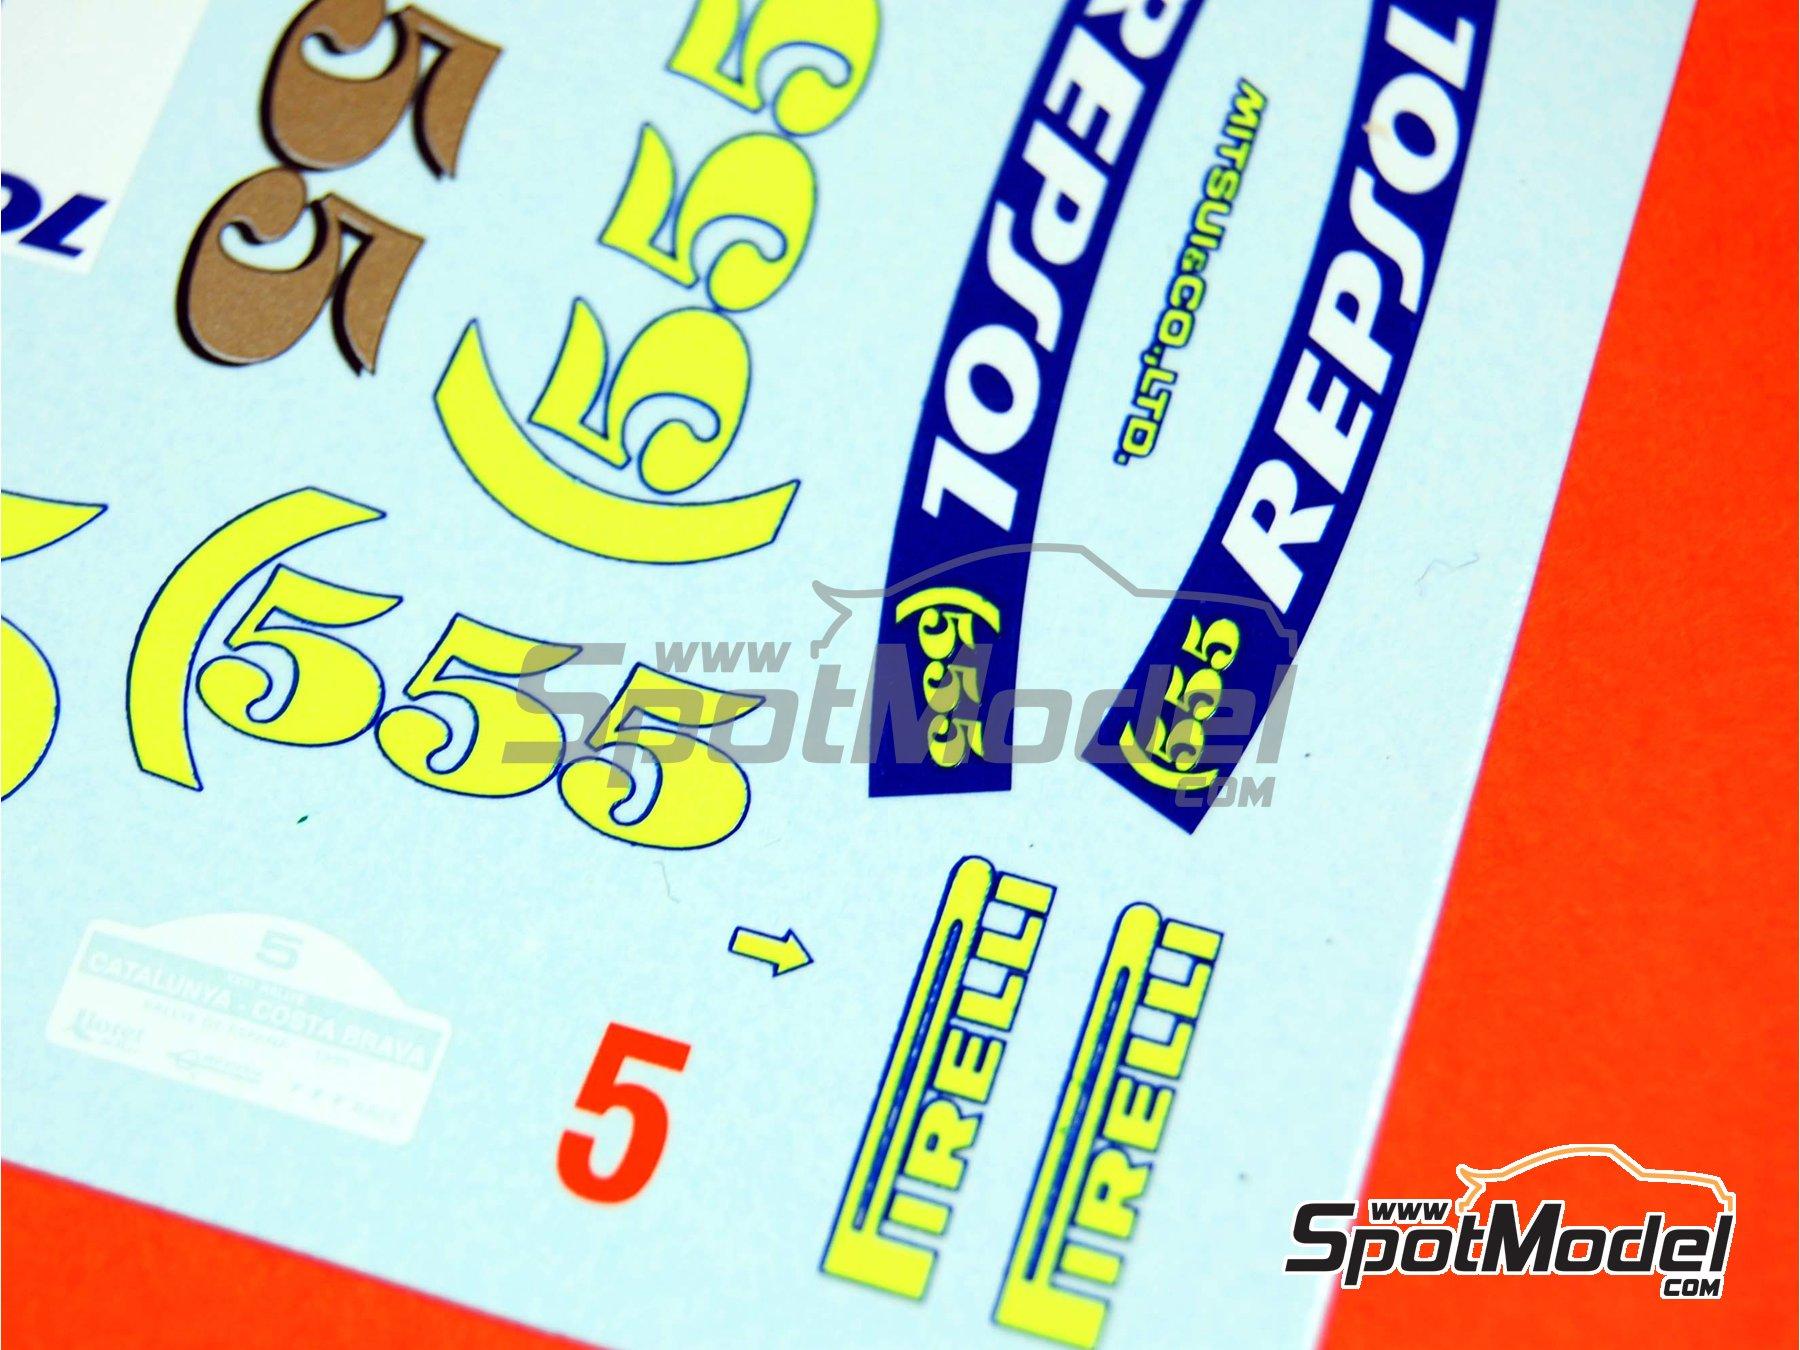 Image 16: Subaru Impreza 555 Group A - Catalunya Costa Dorada RACC Rally, RAC Rally 1995 | Marking / livery in 1/24 scale manufactured by Renaissance Models (ref.TK24-289)